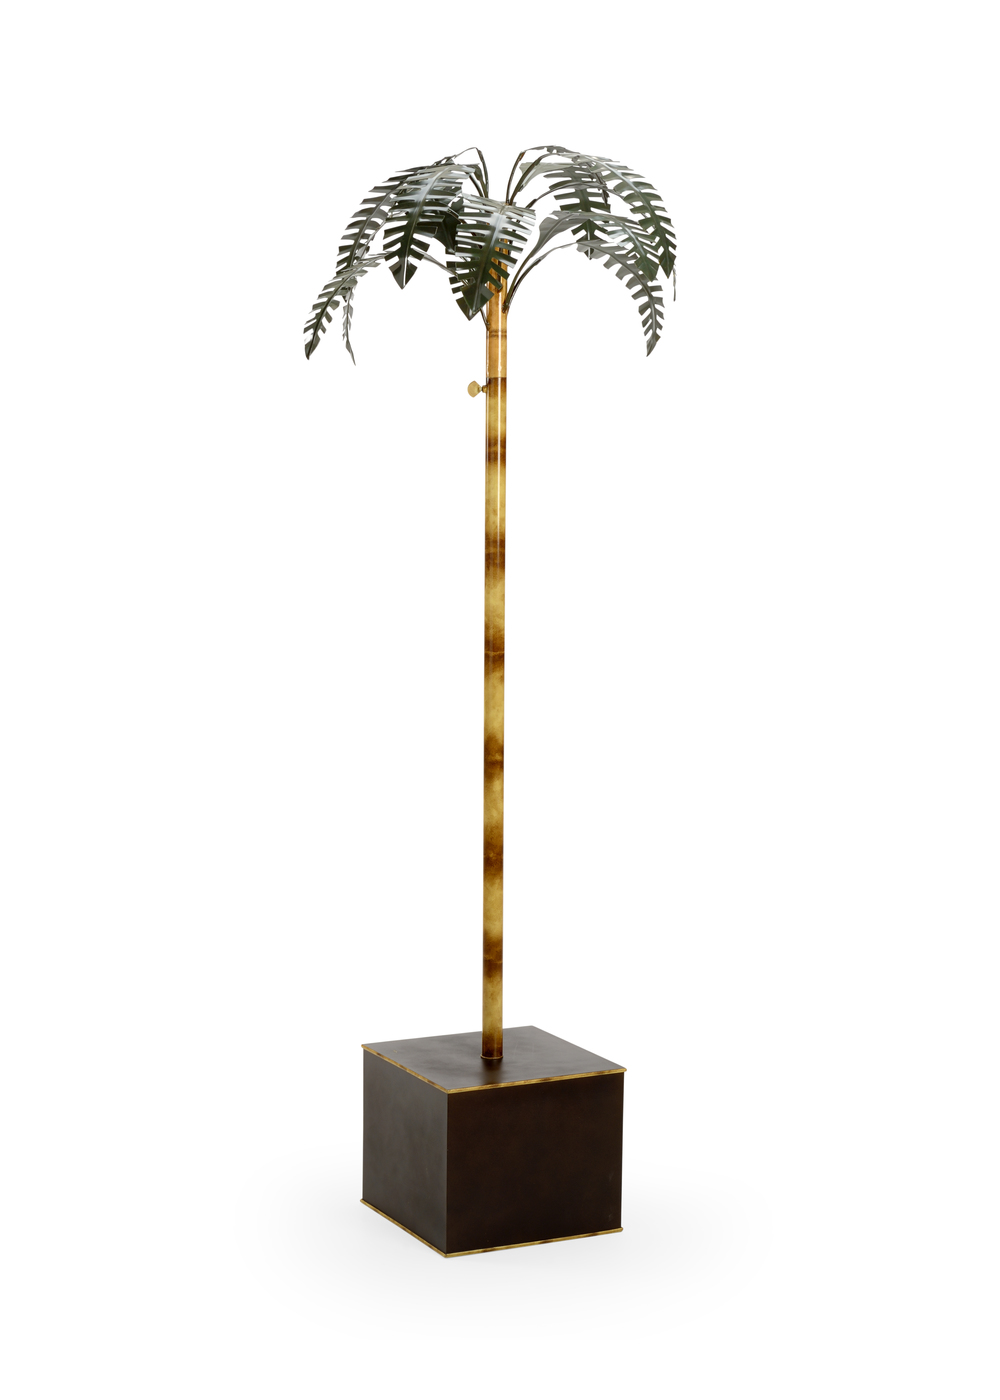 Chelsea House - Naples Palm Tree, Polychrome